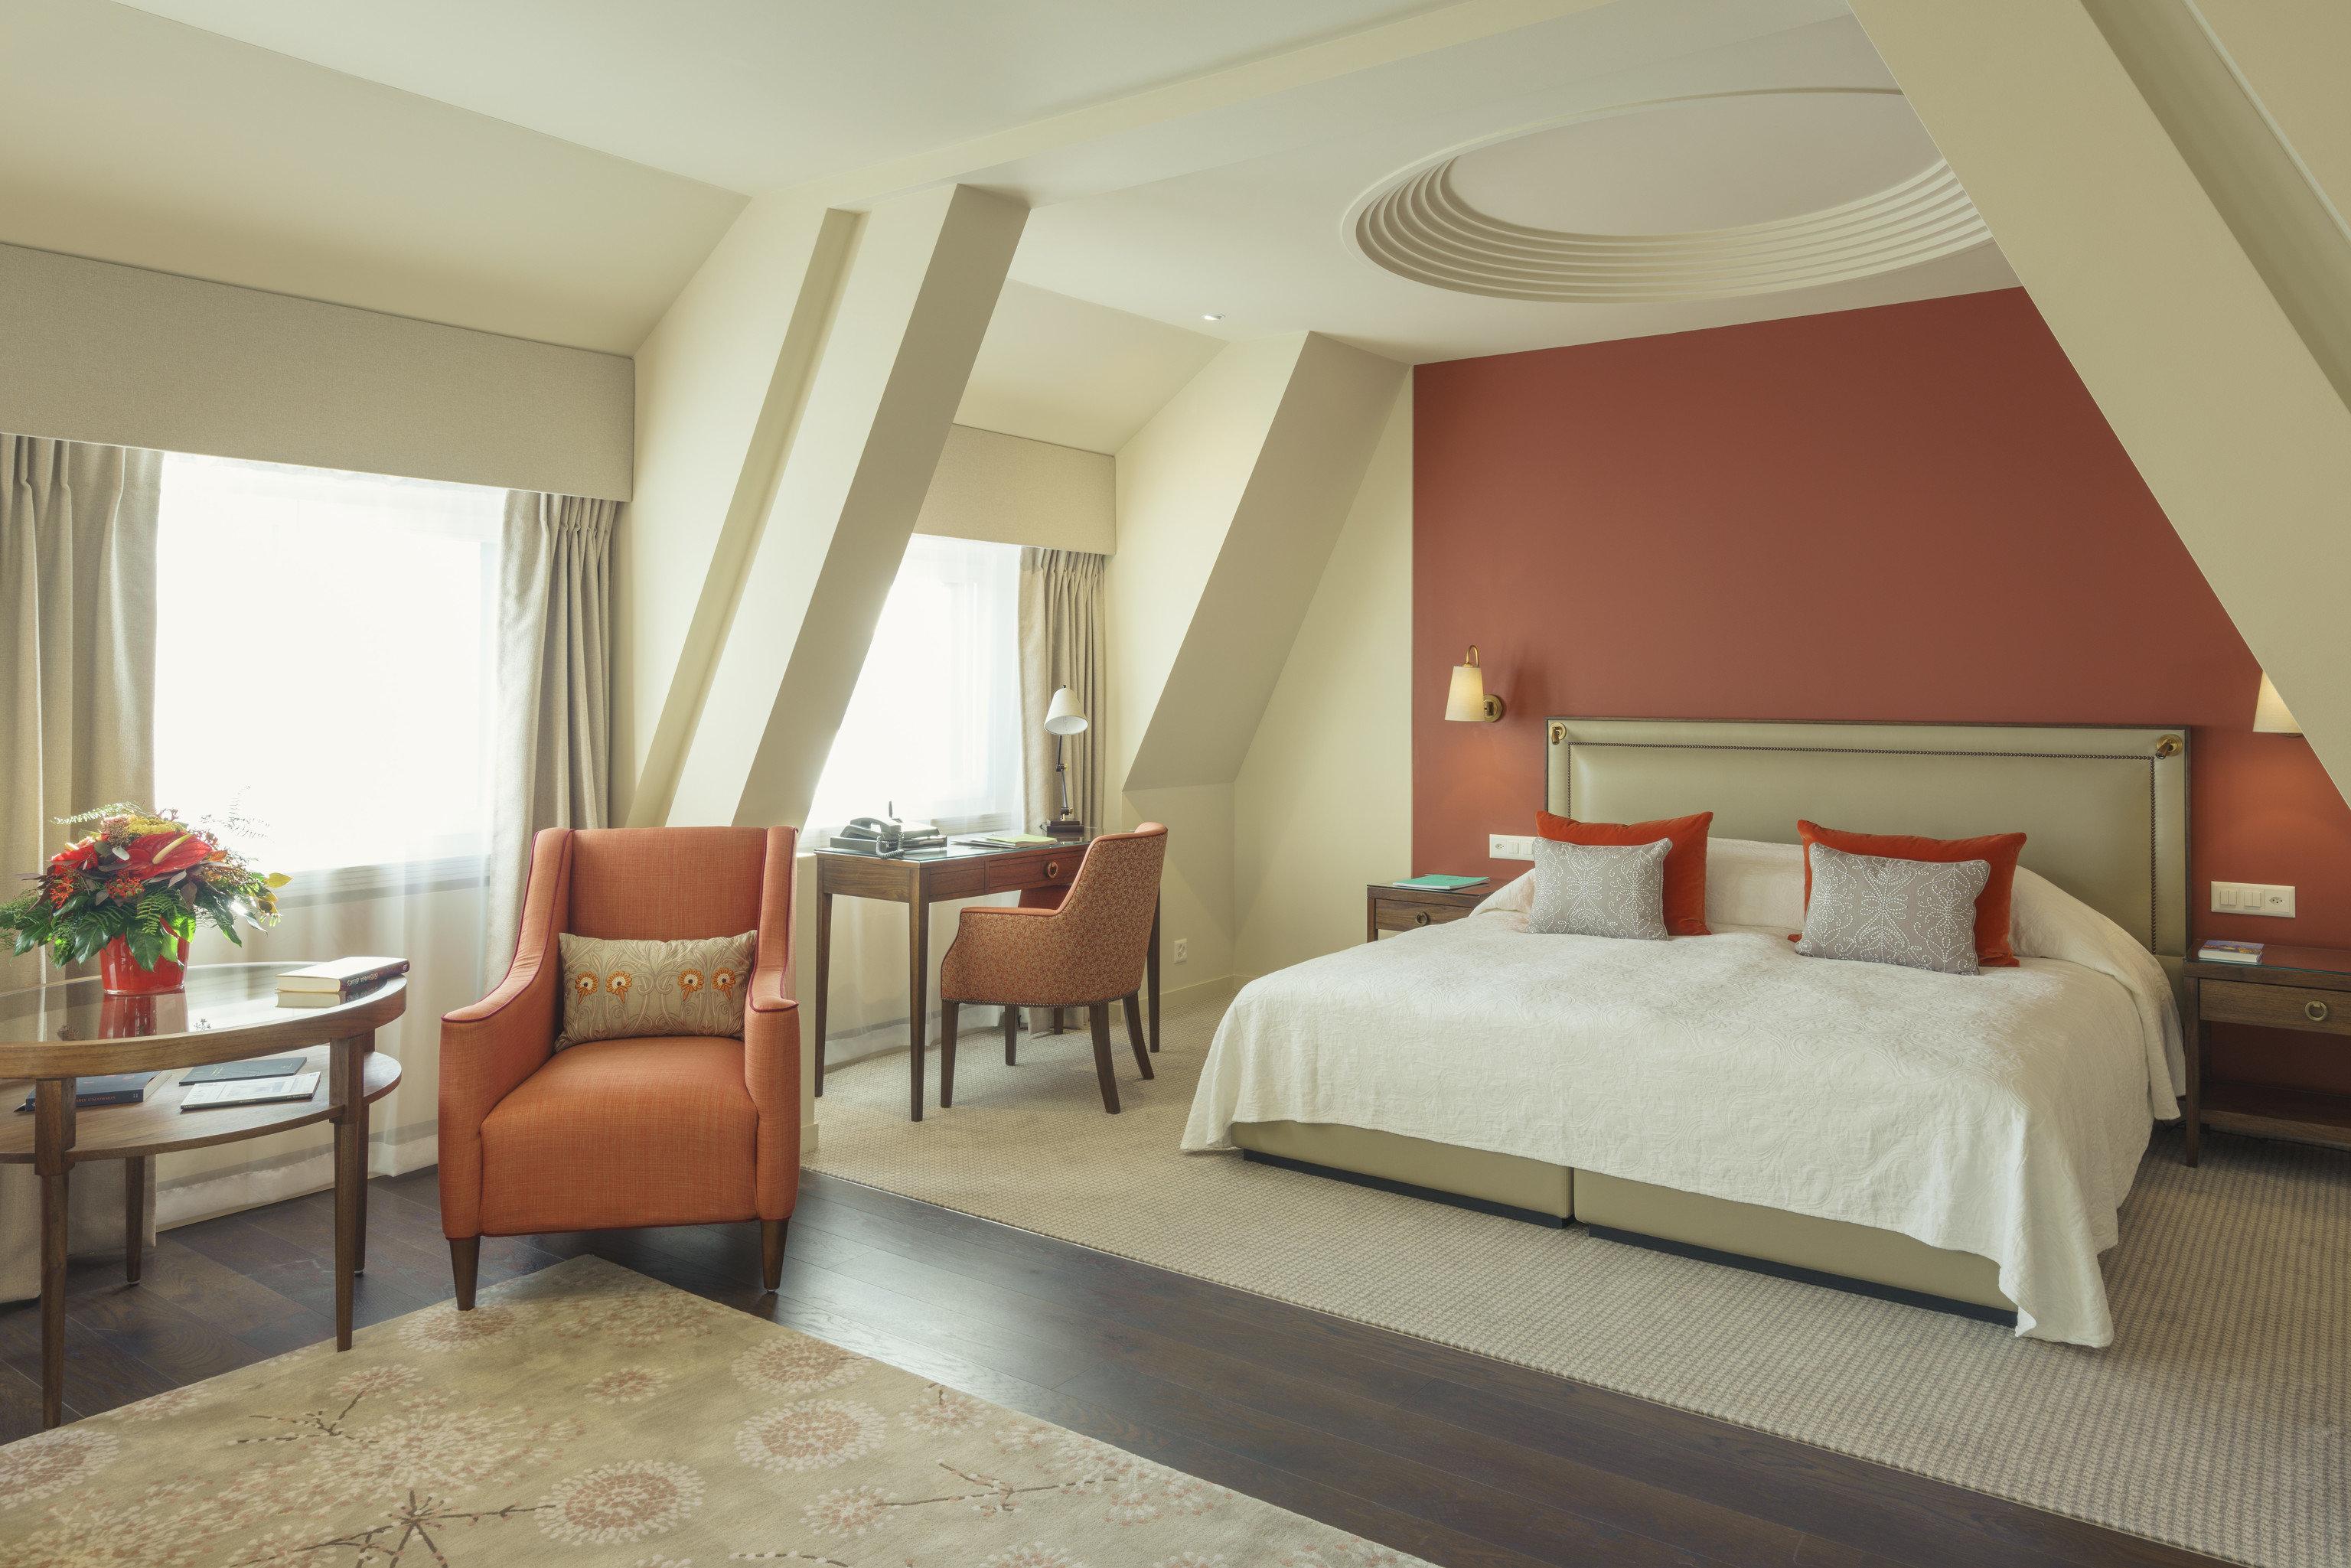 Bedroom Suite bed frame window treatment interior designer flooring